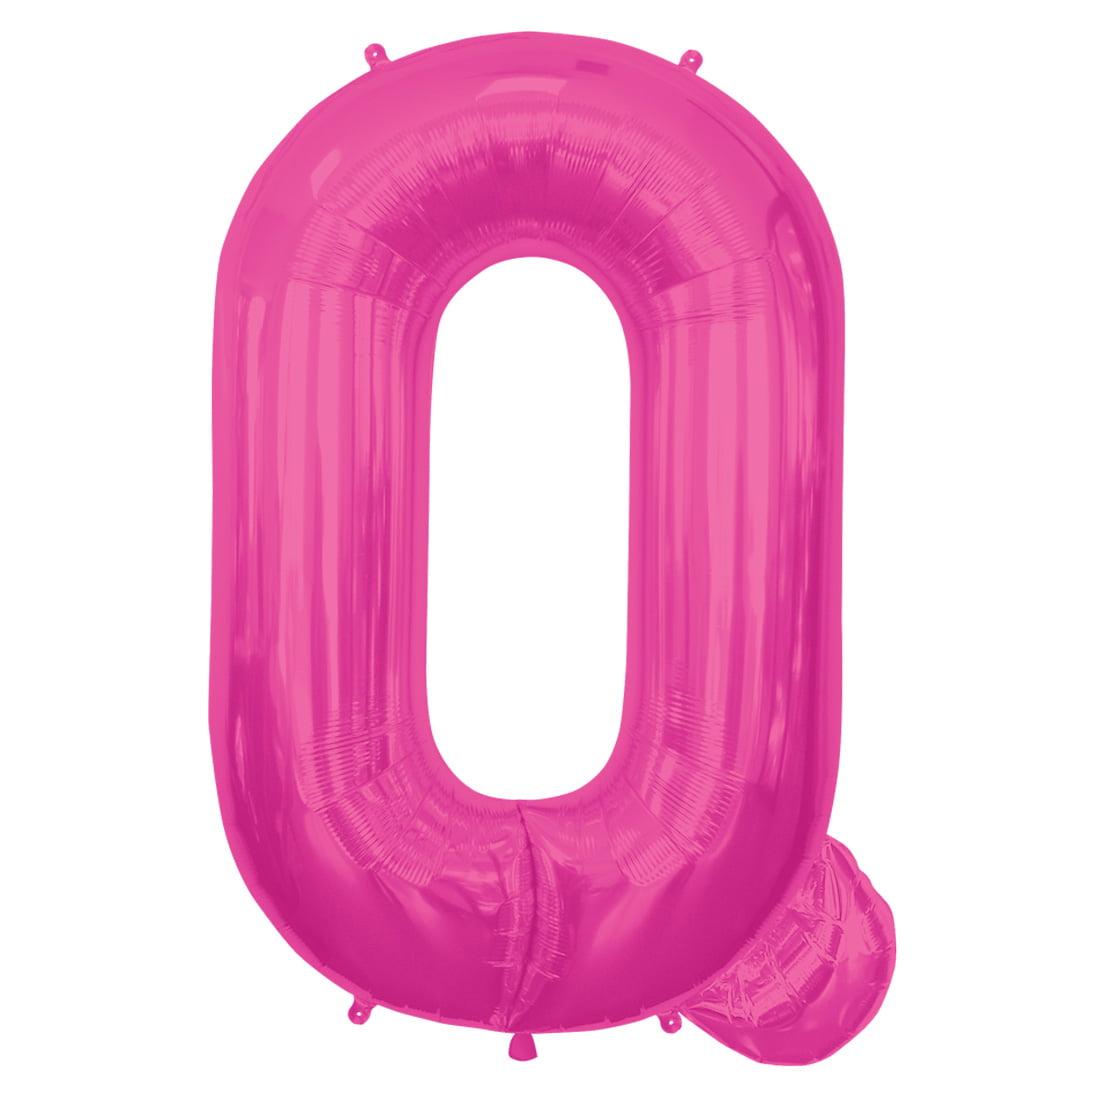 "Northstar Alphabet Letter Q Shape Solid Jumbo Helium 34"" Foil Balloon, Magenta"